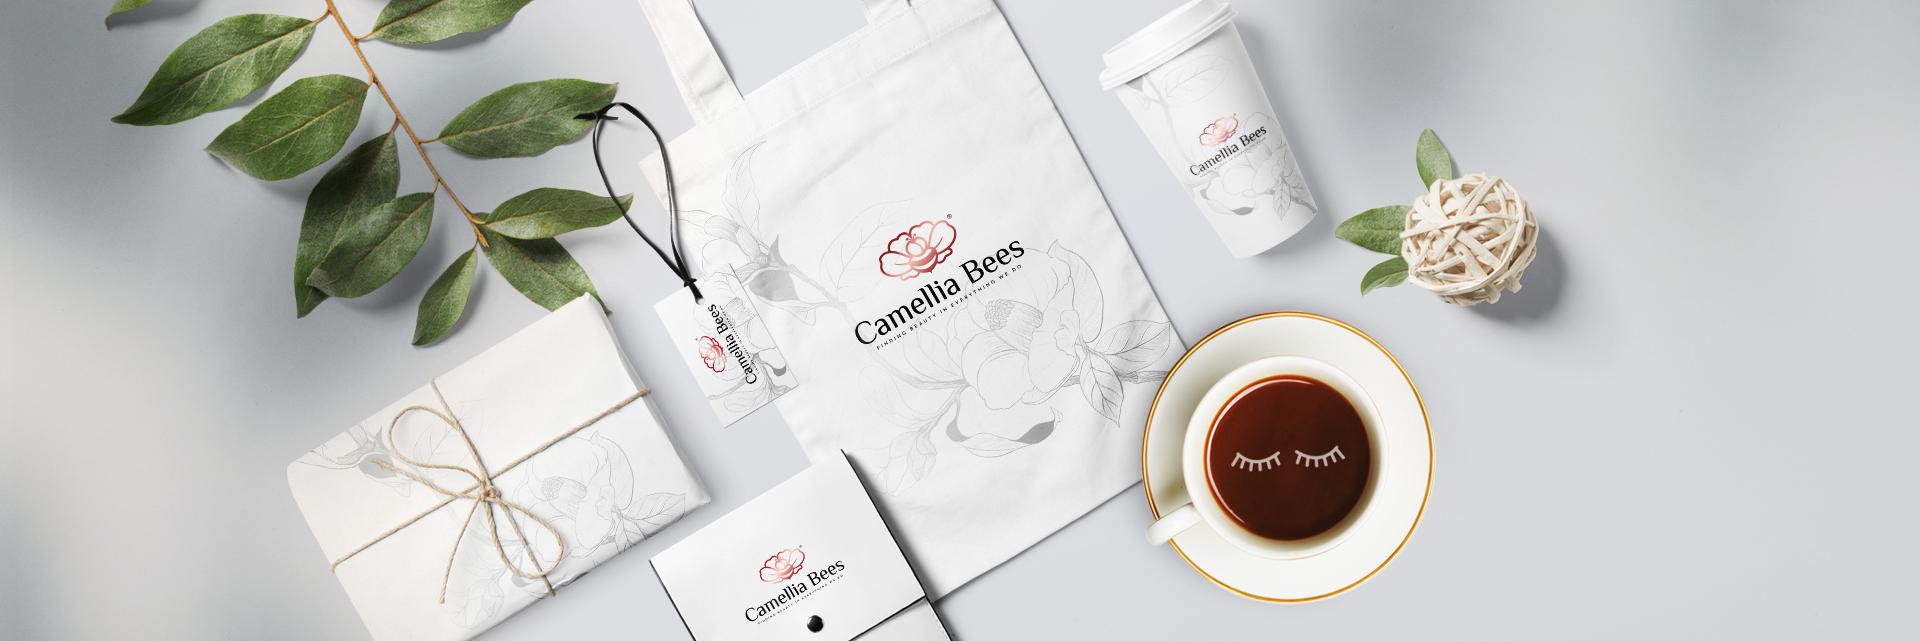 Thiet-ke-logo-camelliabees-slide-2